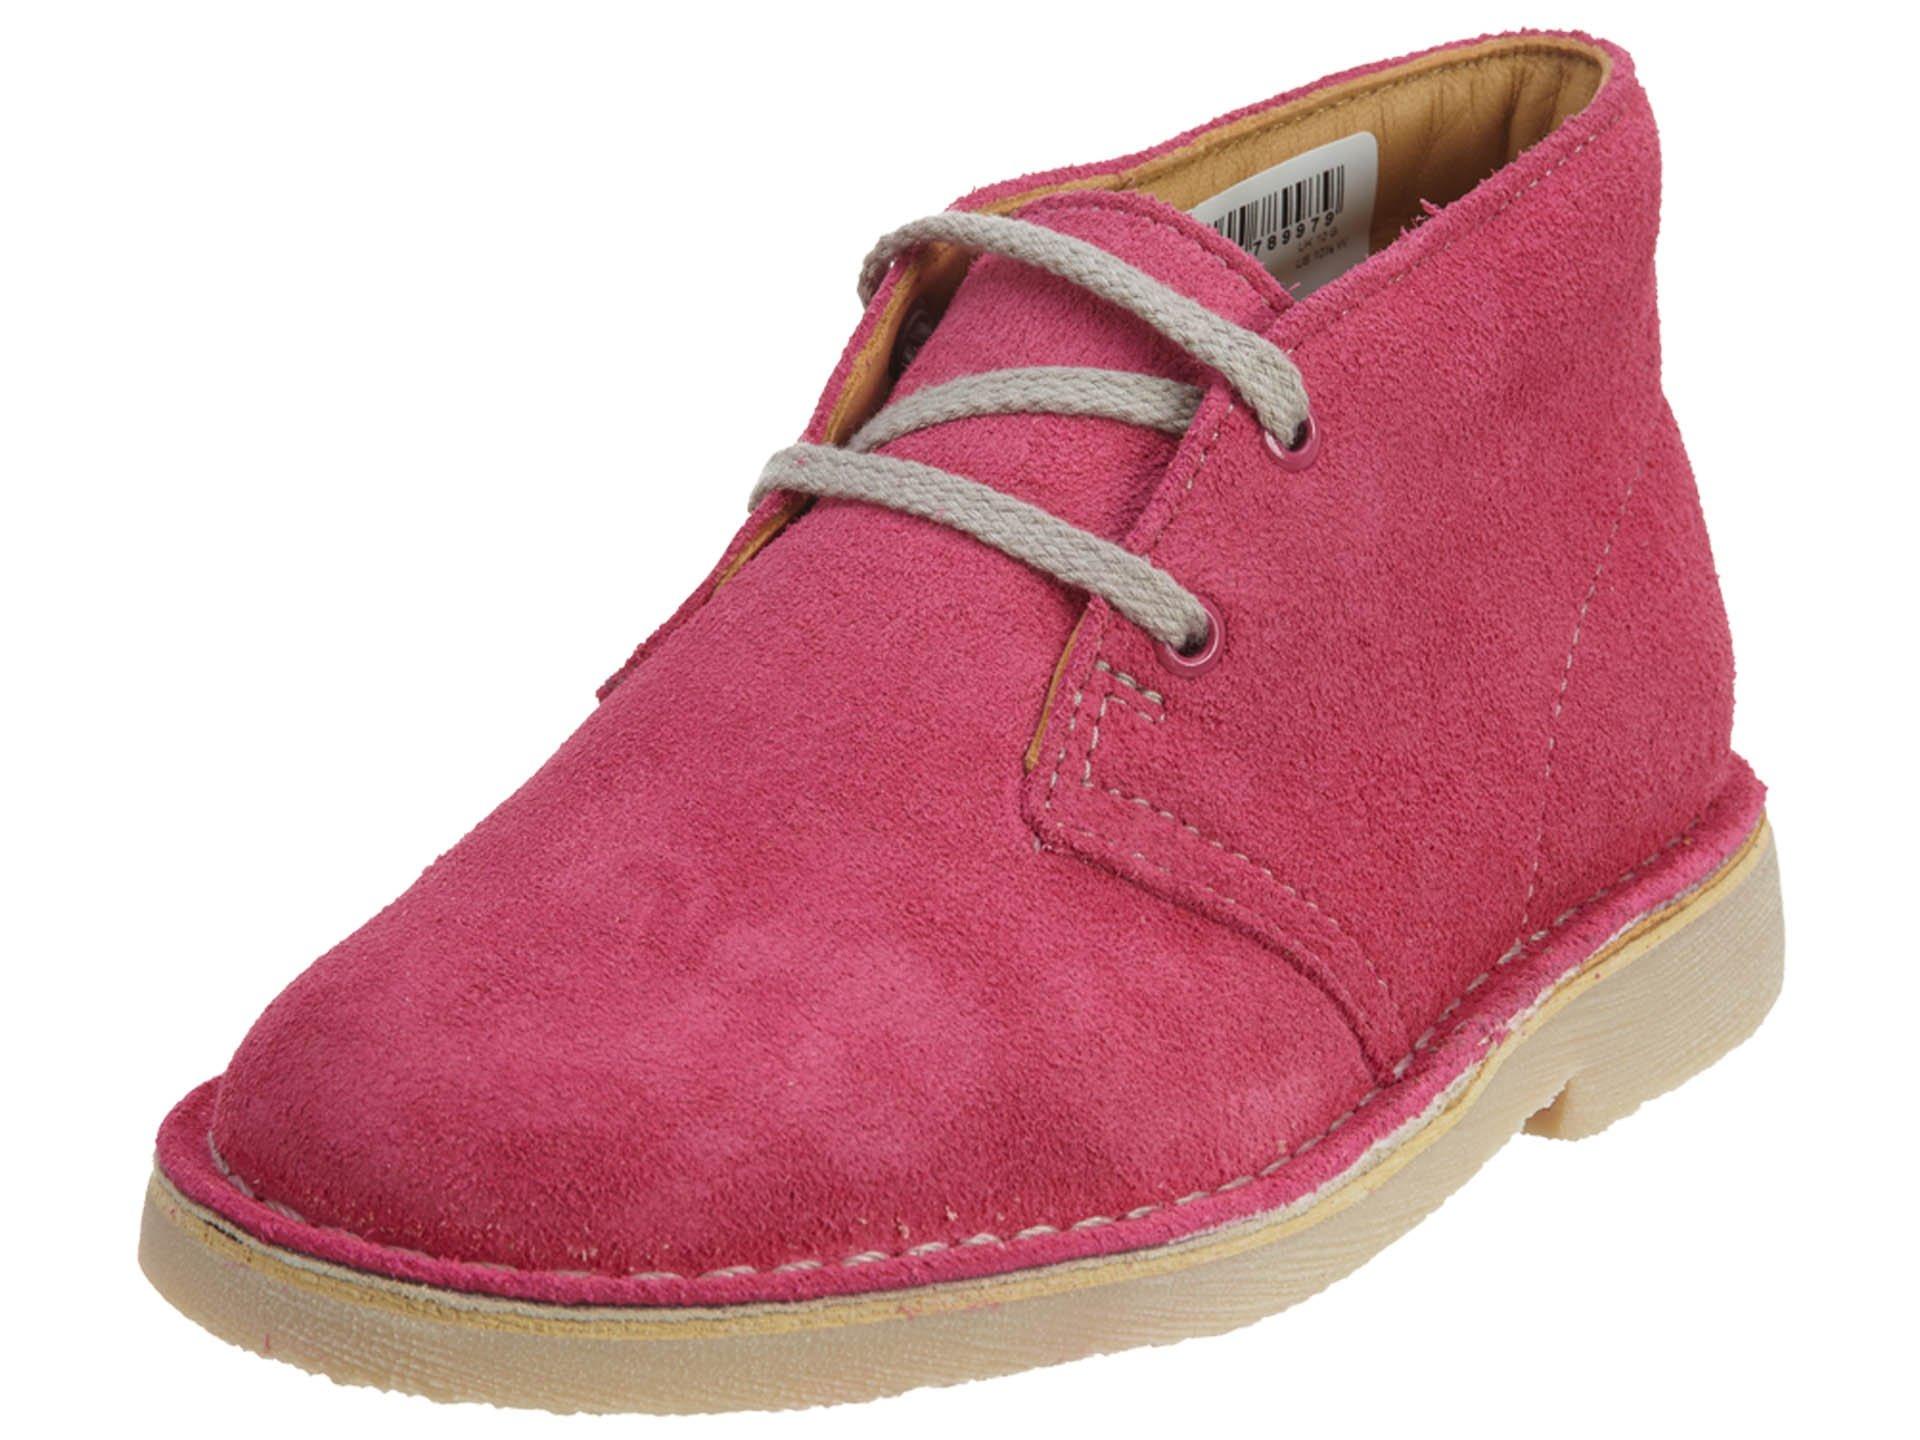 Clarks Originals Kids Pink Desert Boot Toddler 11.0 Wide US Toddler